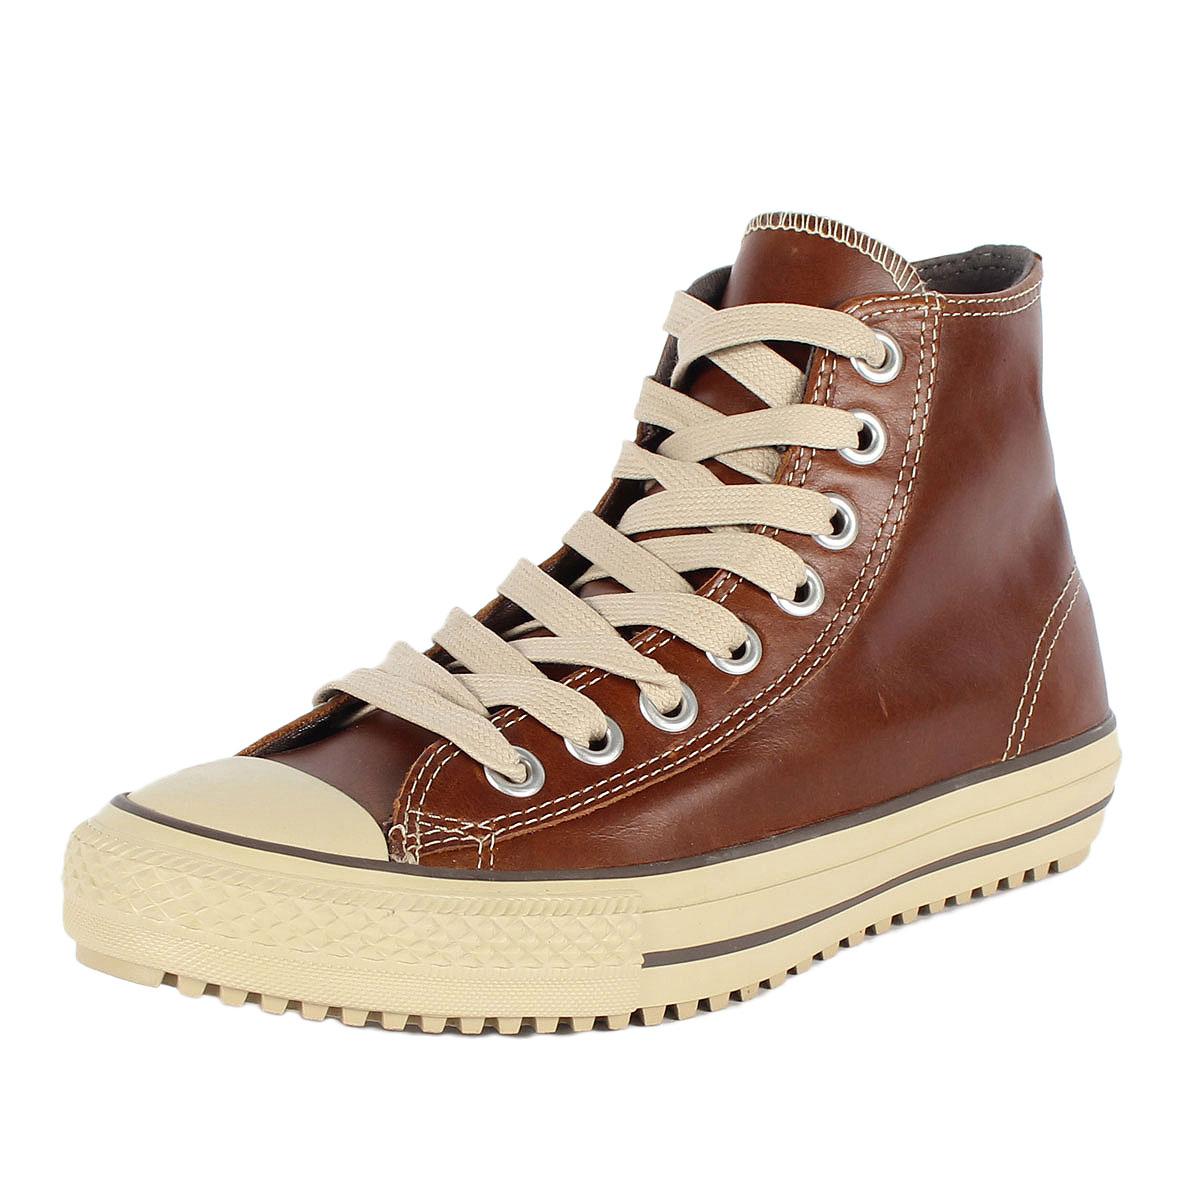 Converse - Chuck Taylor Hi-top Boots in Pine Cone